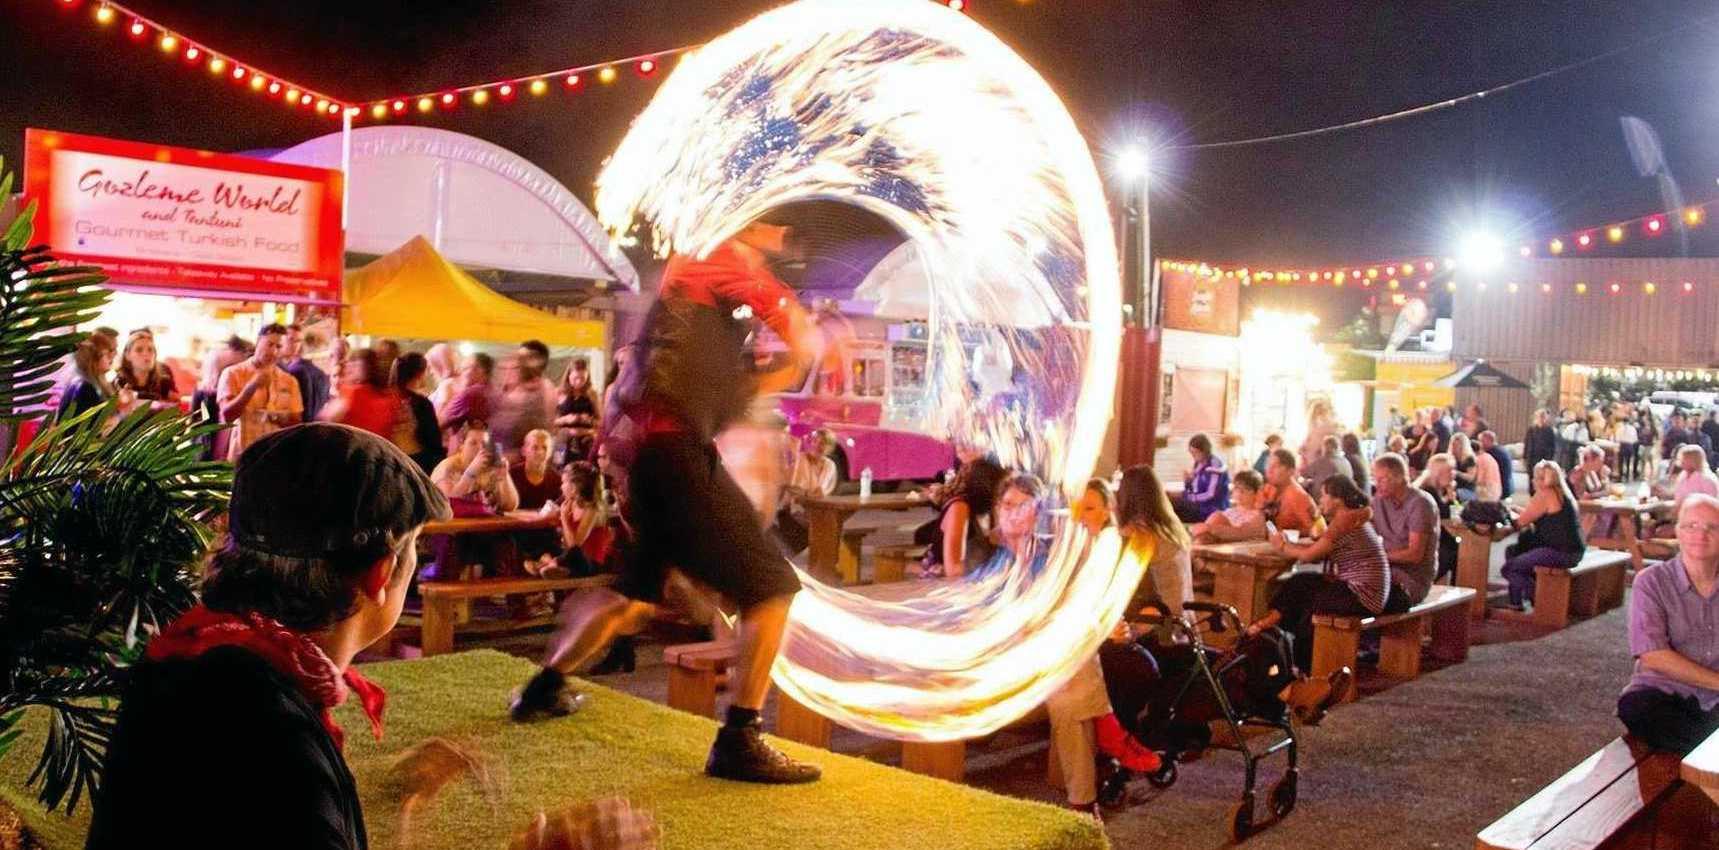 Award-winning street food, night market and entertainment destination NightQuarter is coming to the Sunshine Coast.